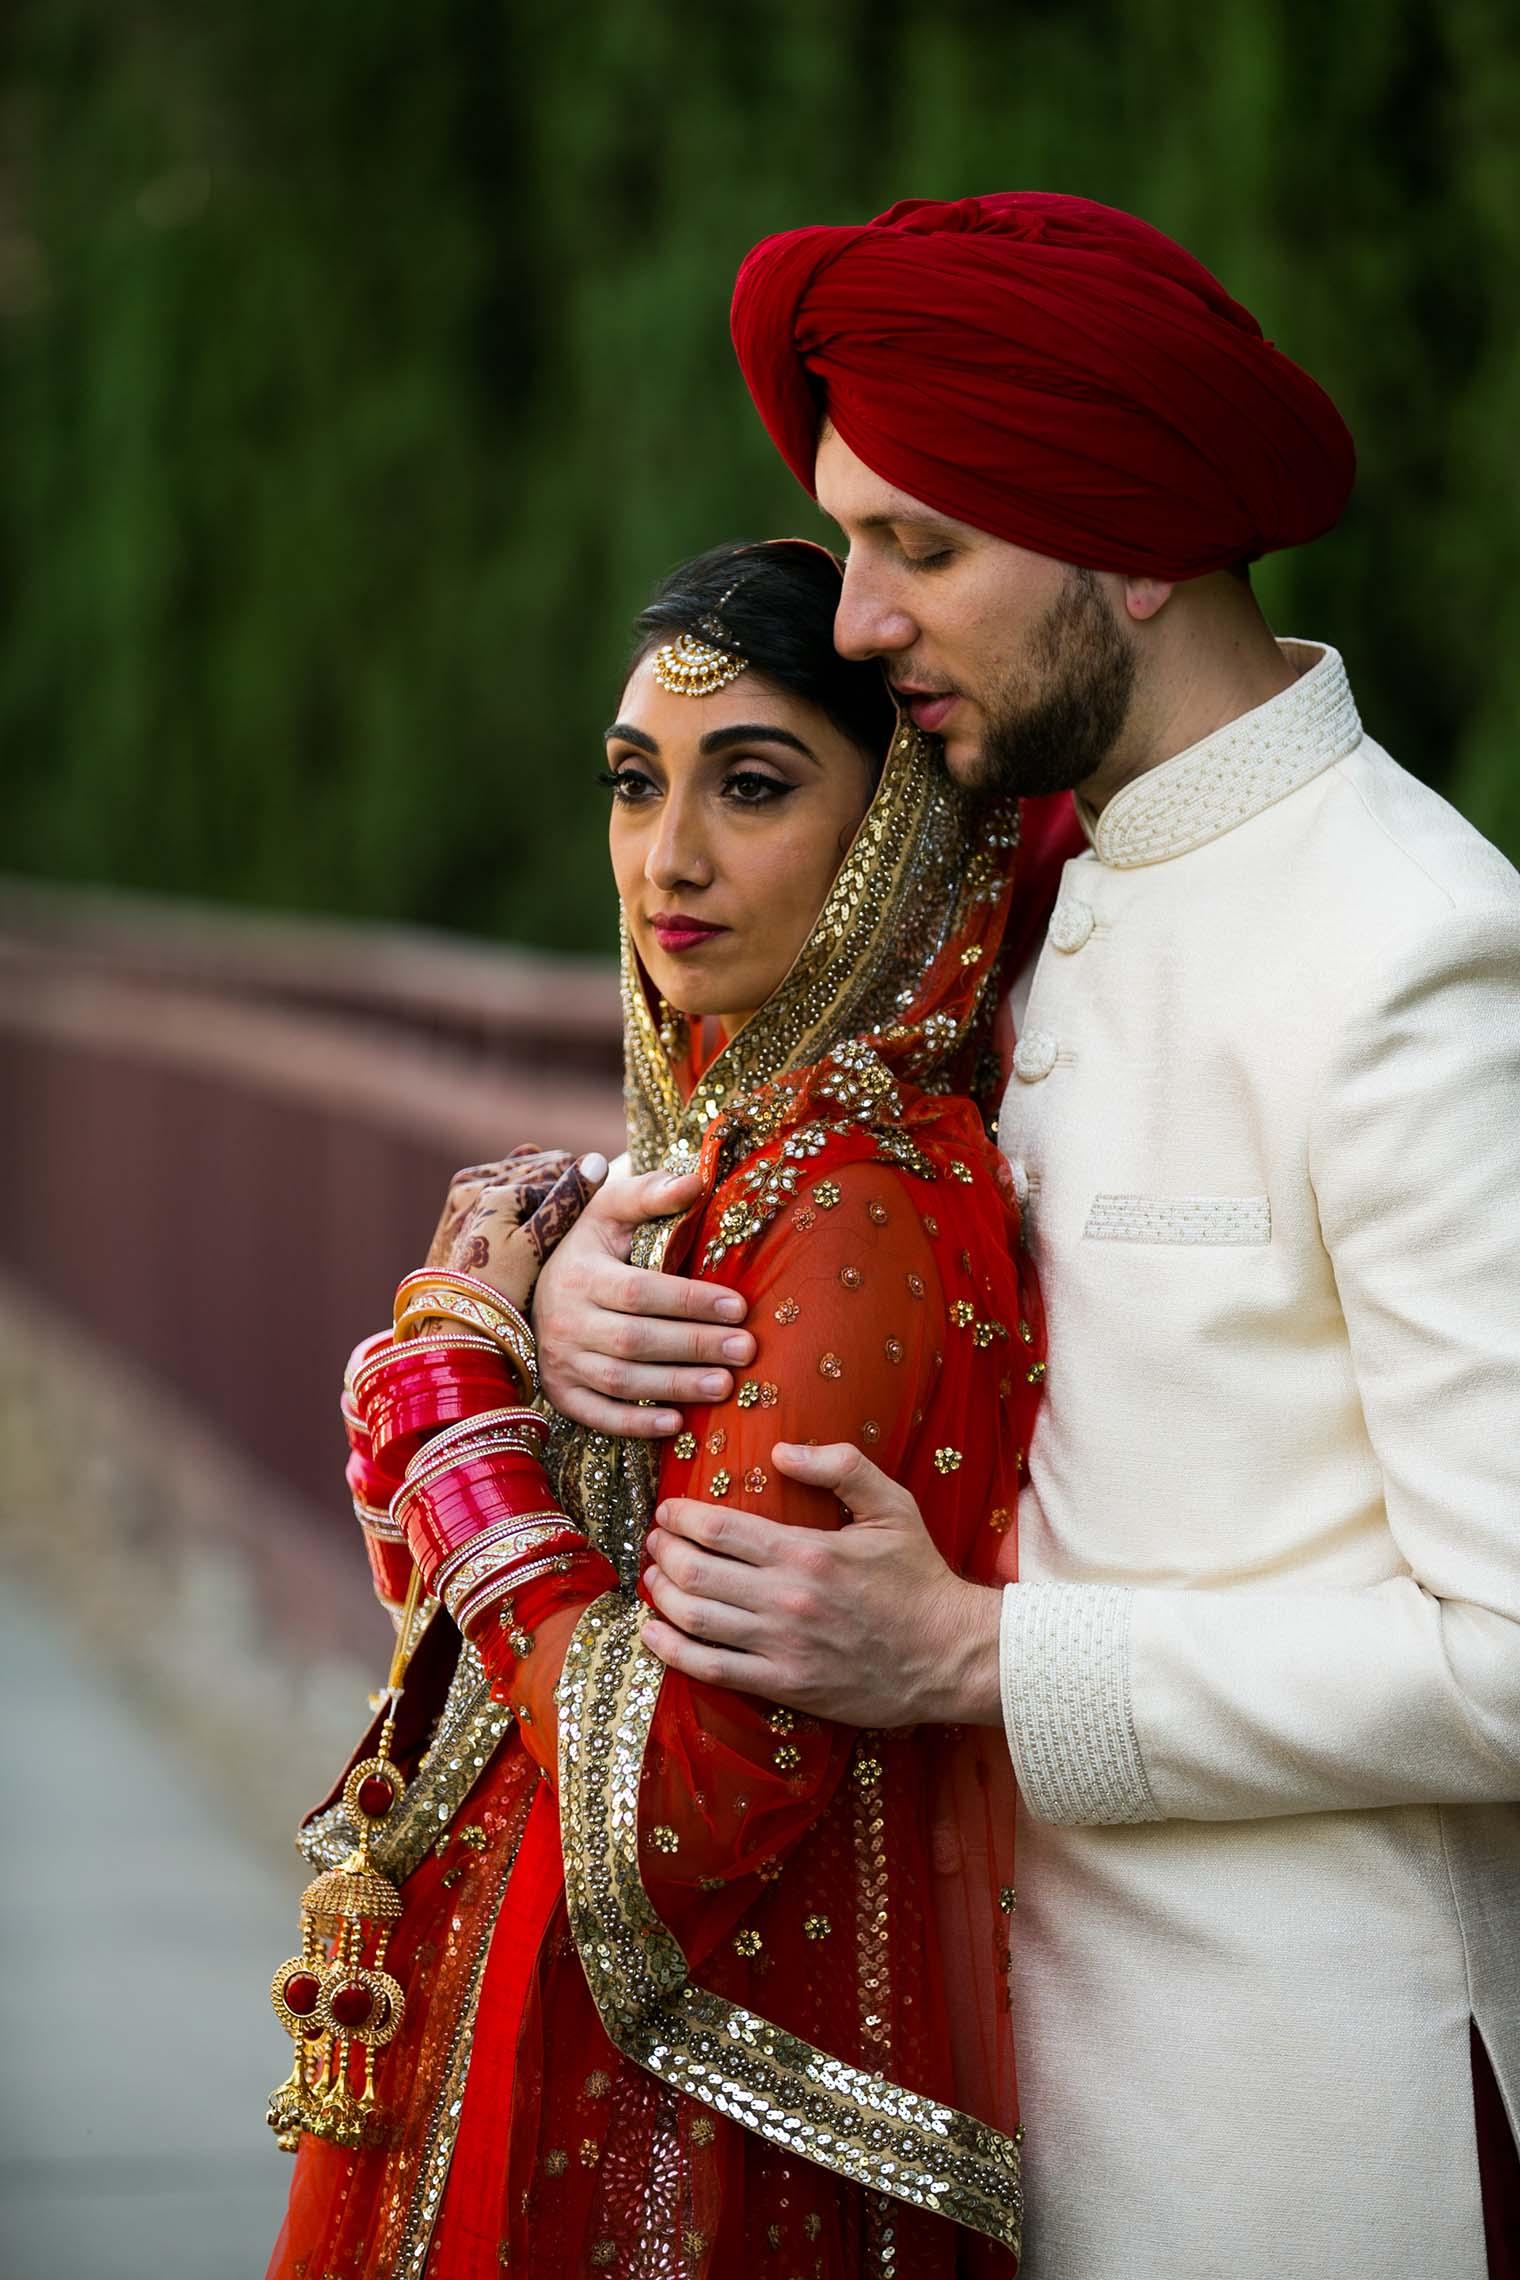 Bride and Groom at Gurdwara Sahib of Fremont